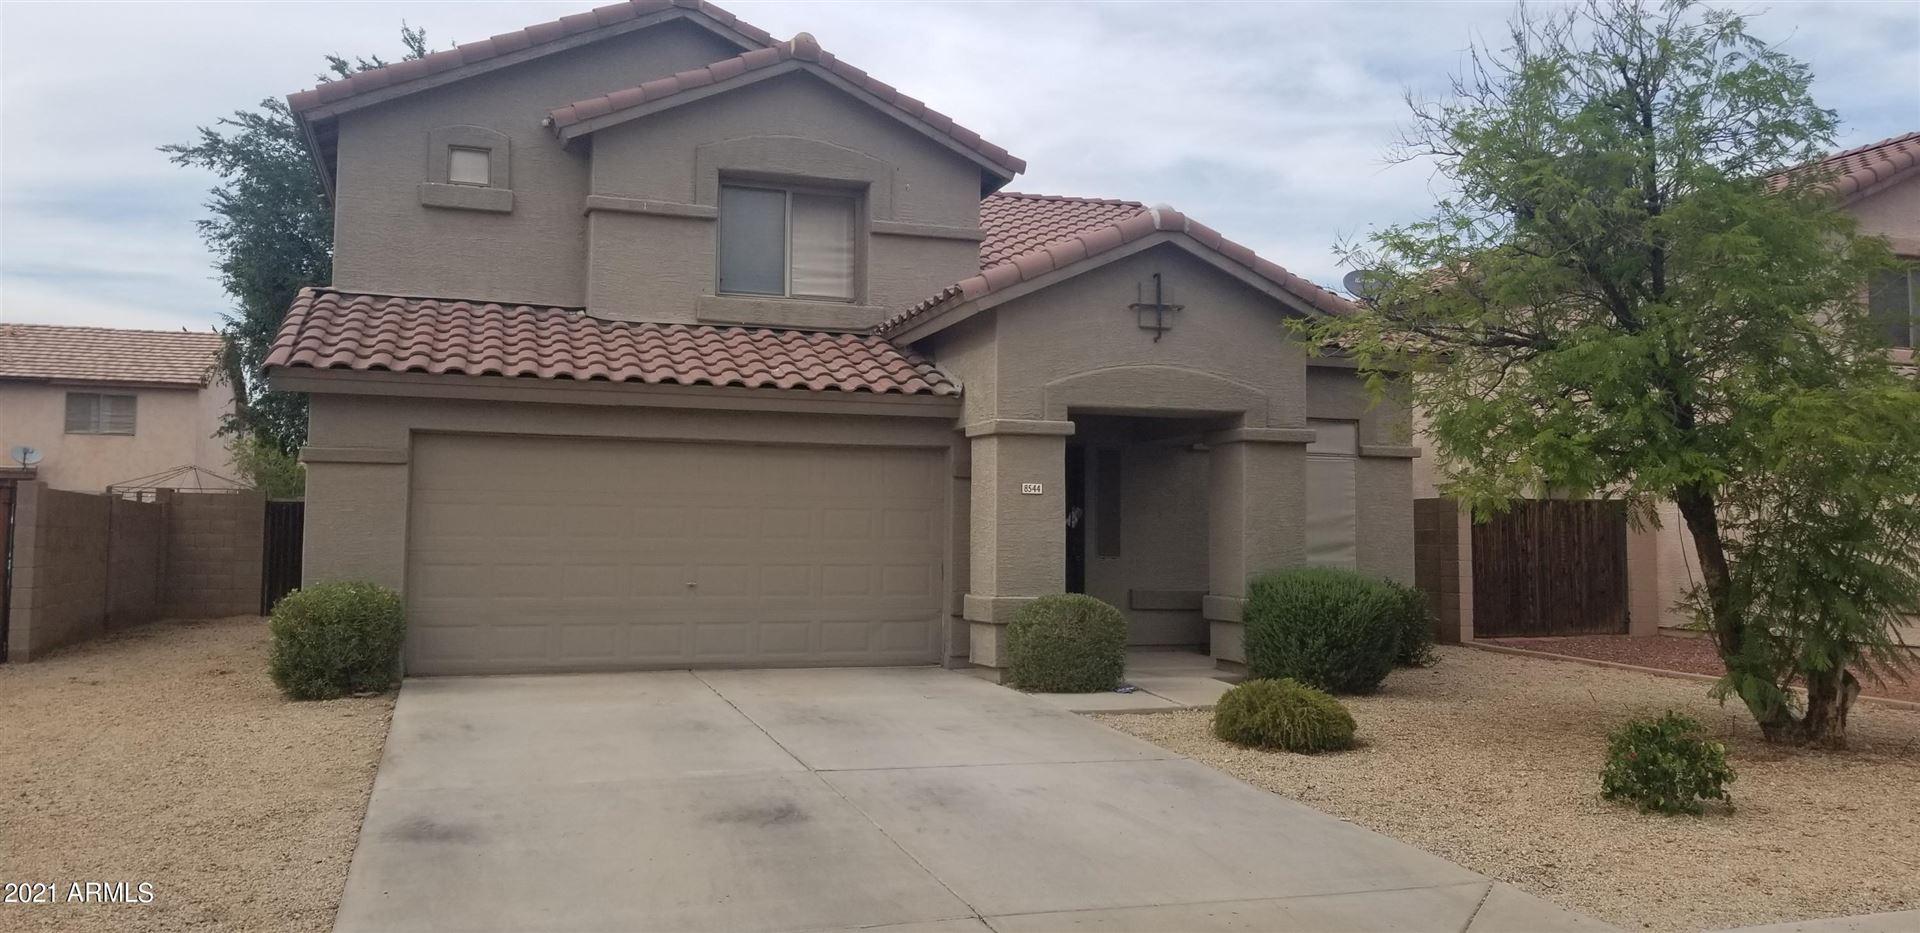 Photo of 8544 W VOGEL Avenue, Peoria, AZ 85345 (MLS # 6268204)